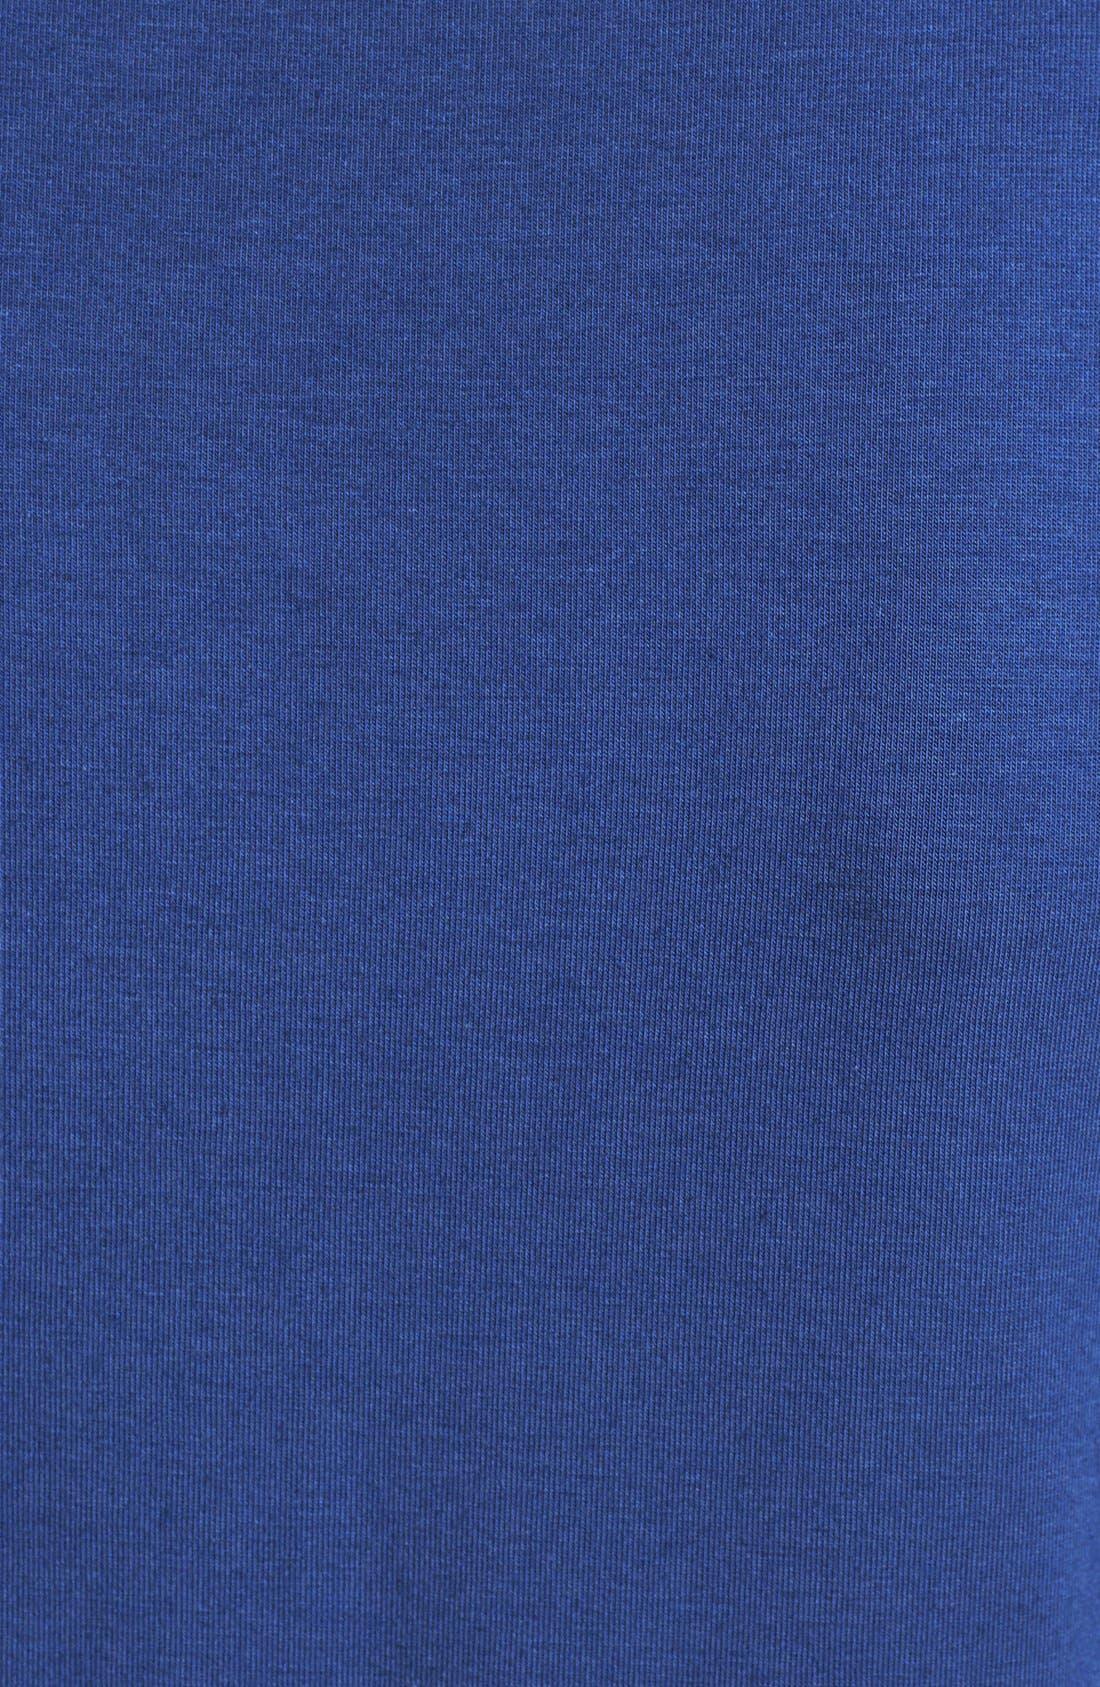 Alternate Image 3  - Amber Sun 'Madeline' Layering Tank